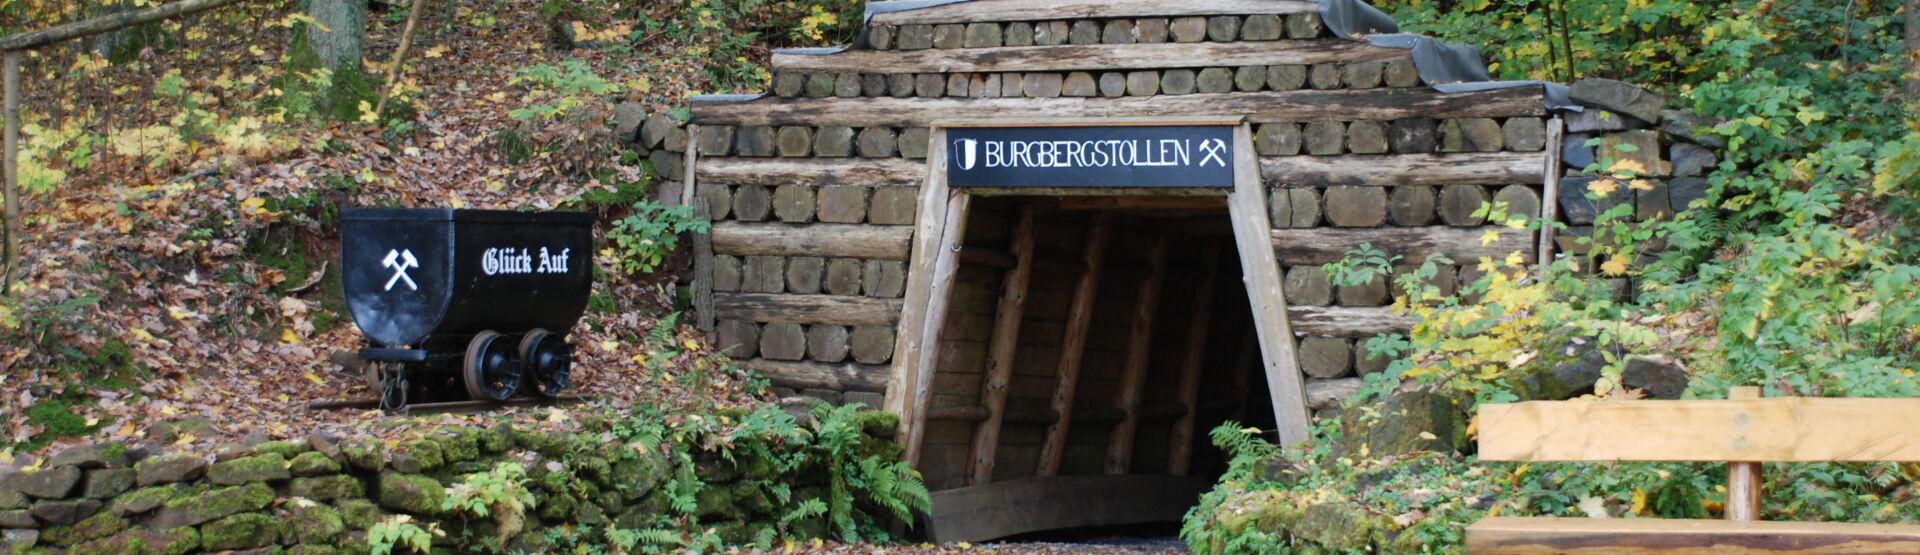 Burgbergstollen